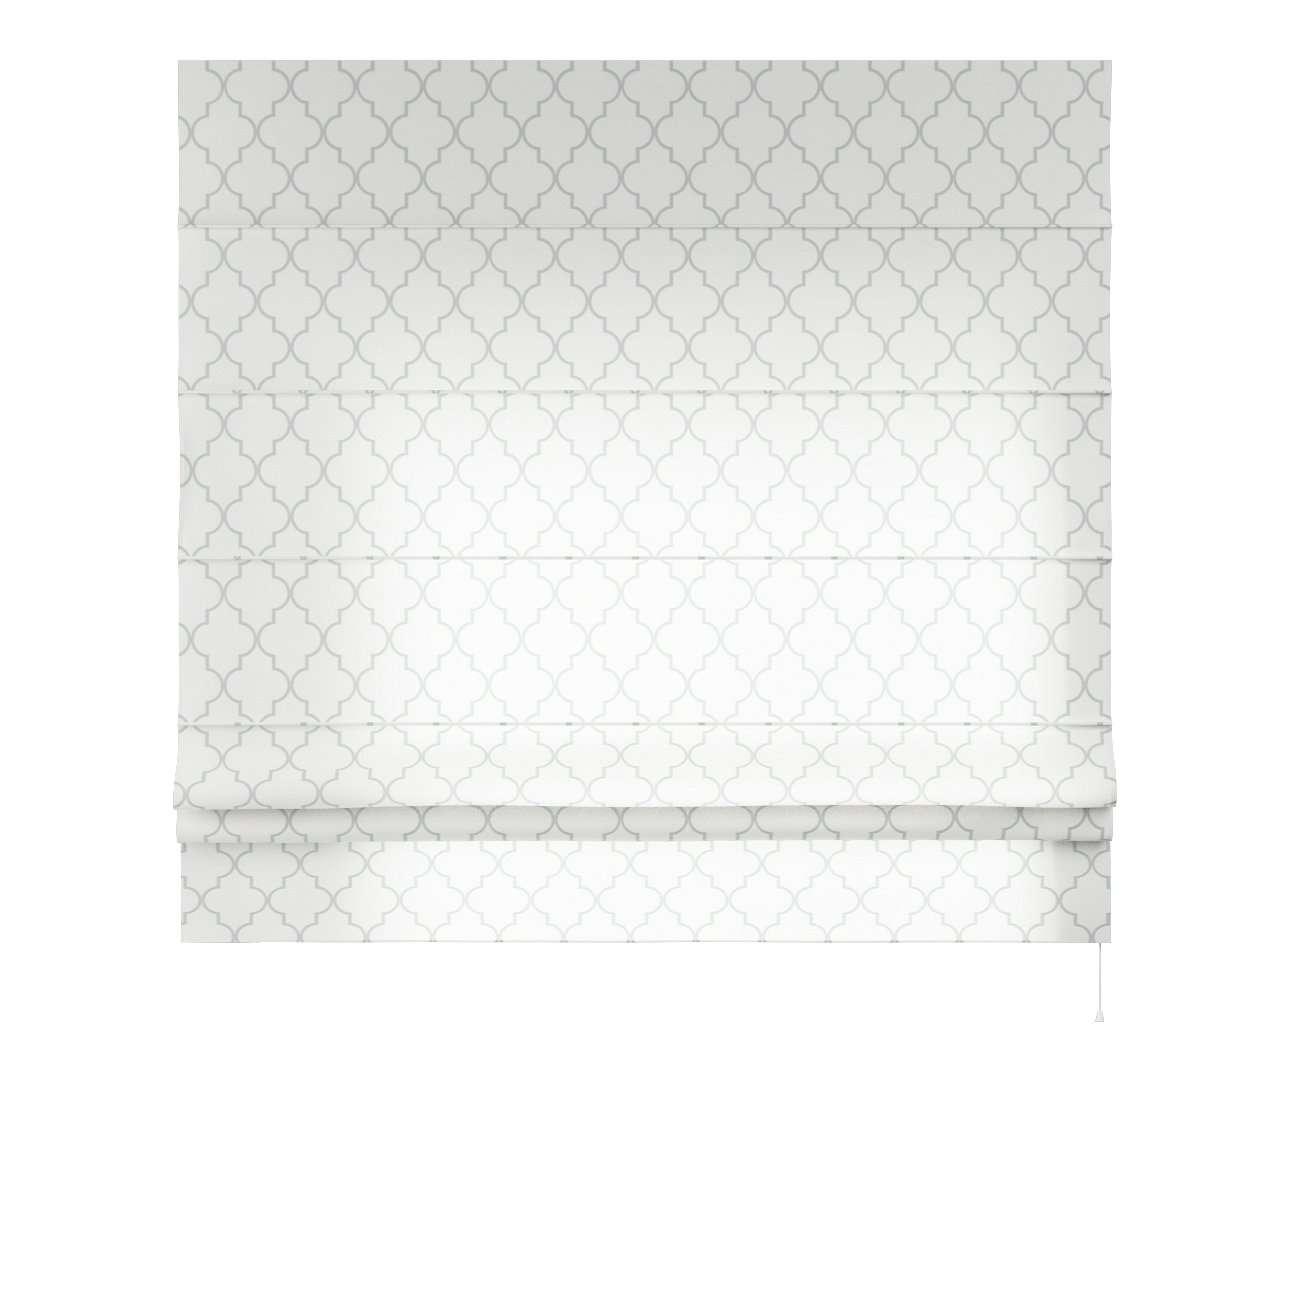 Rímska roleta Padva 80 x 170 cm V kolekcii Comics, tkanina: 137-85